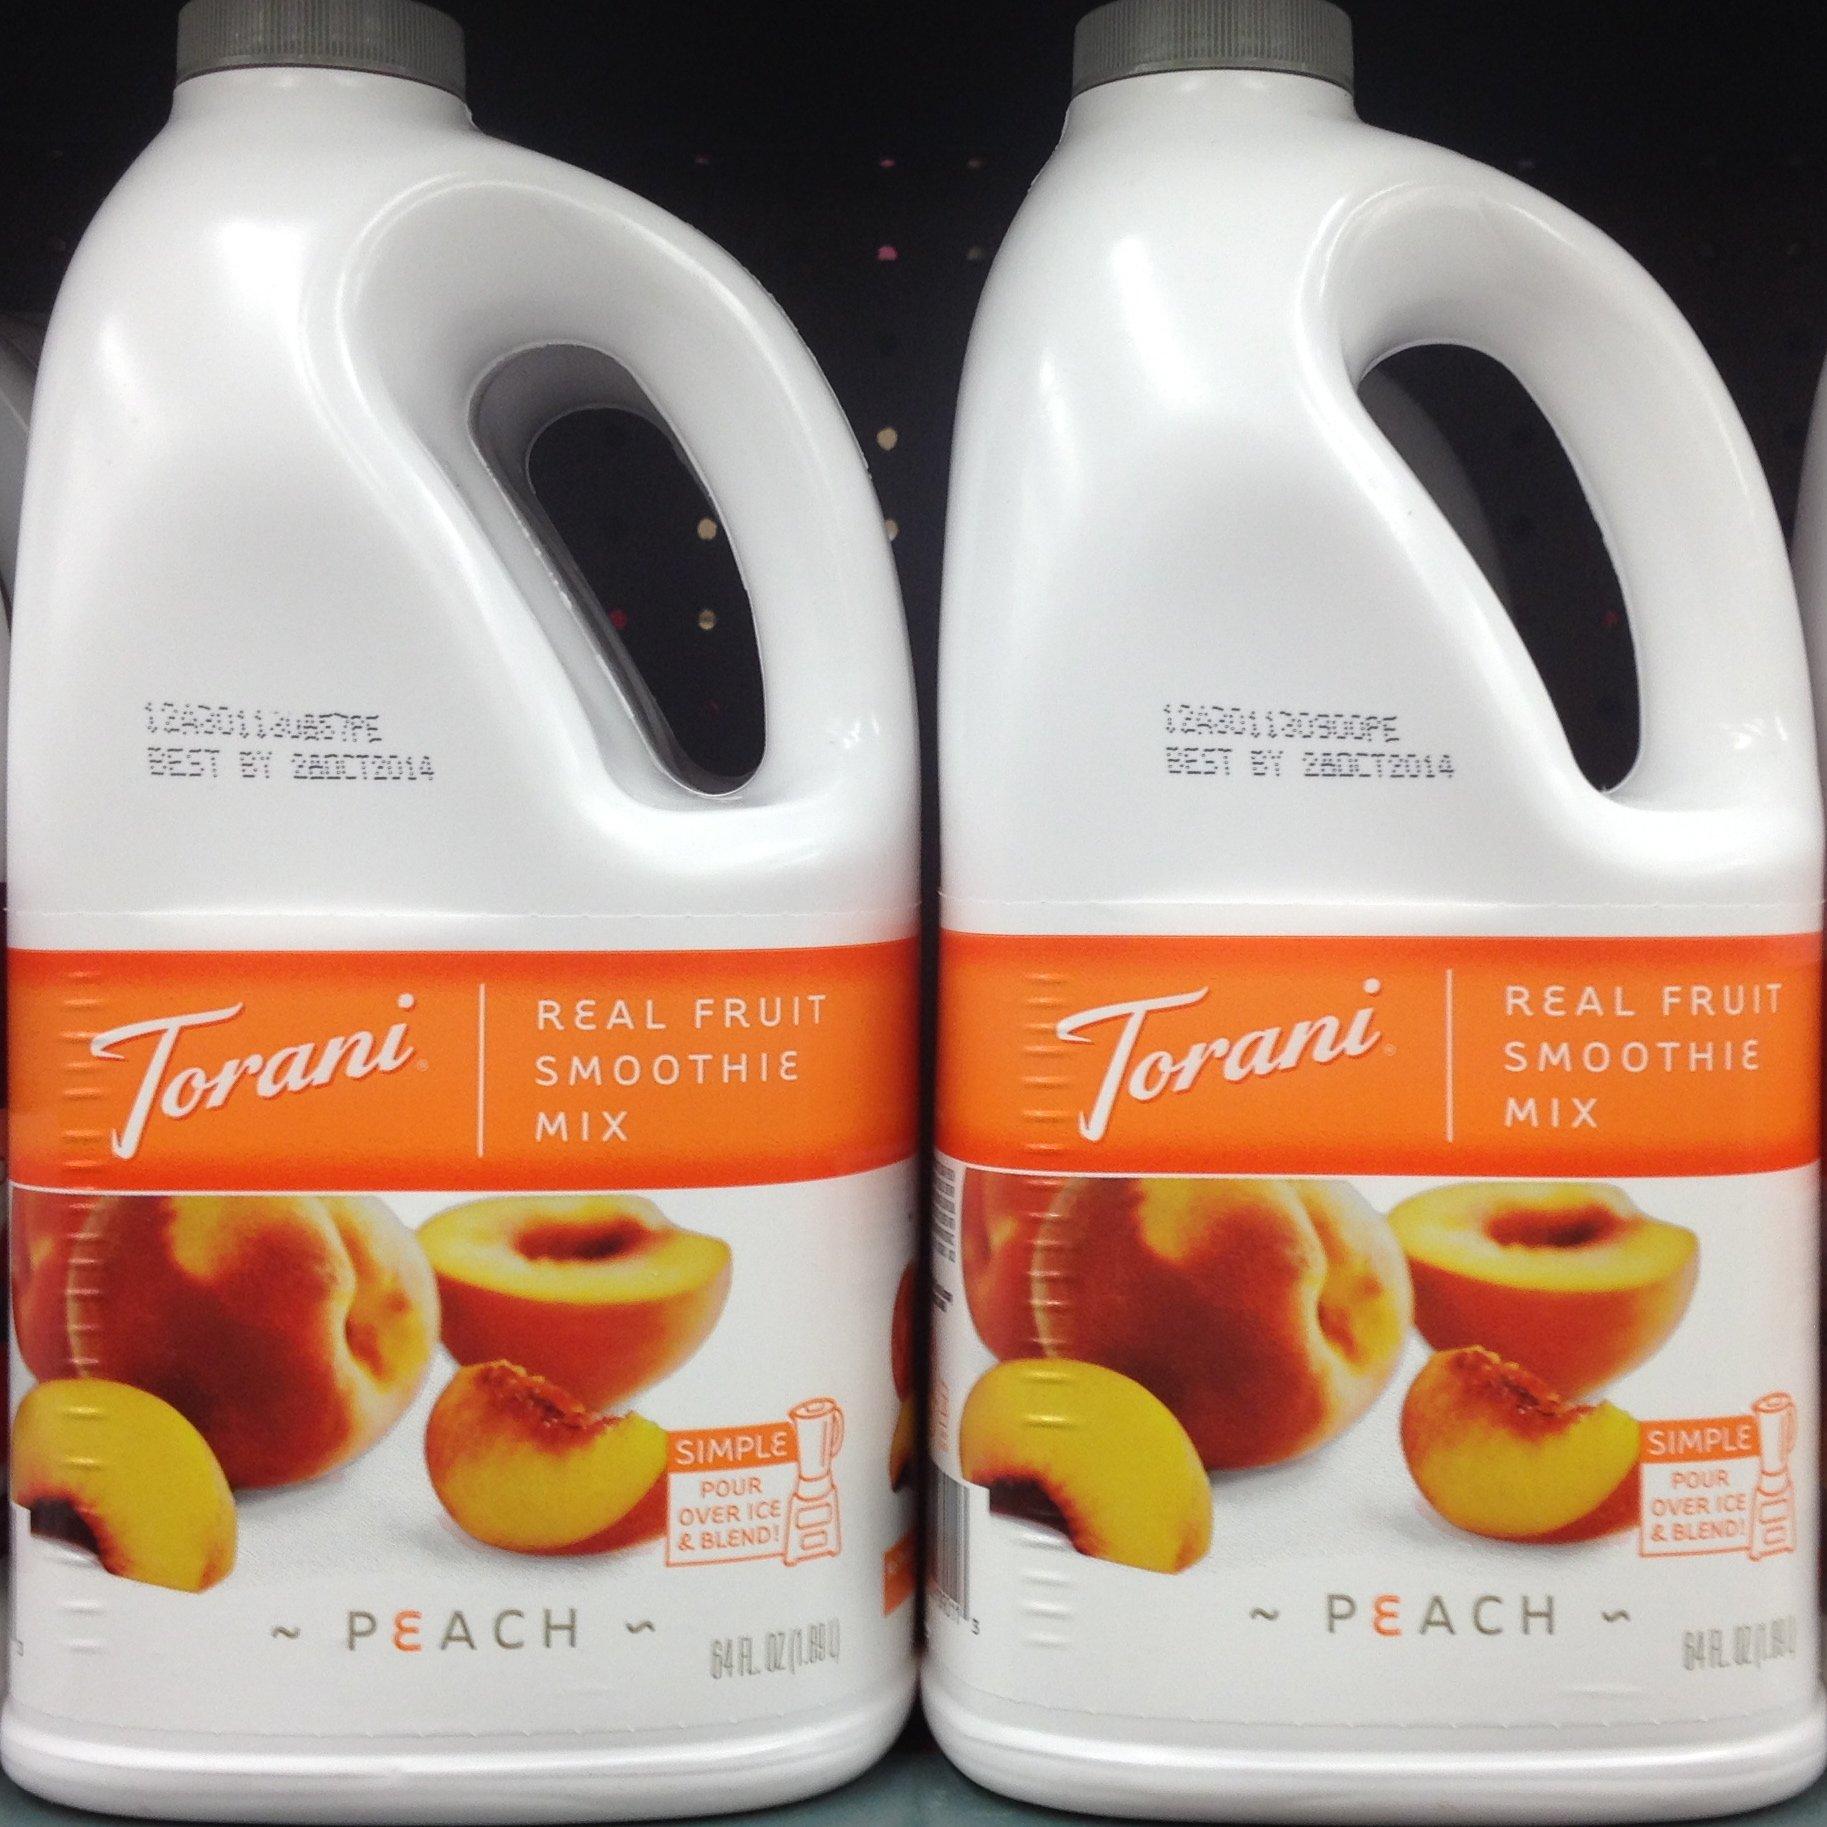 Torani Real Fruit Smoothie Mix PEACH 64oz (2 Pack)